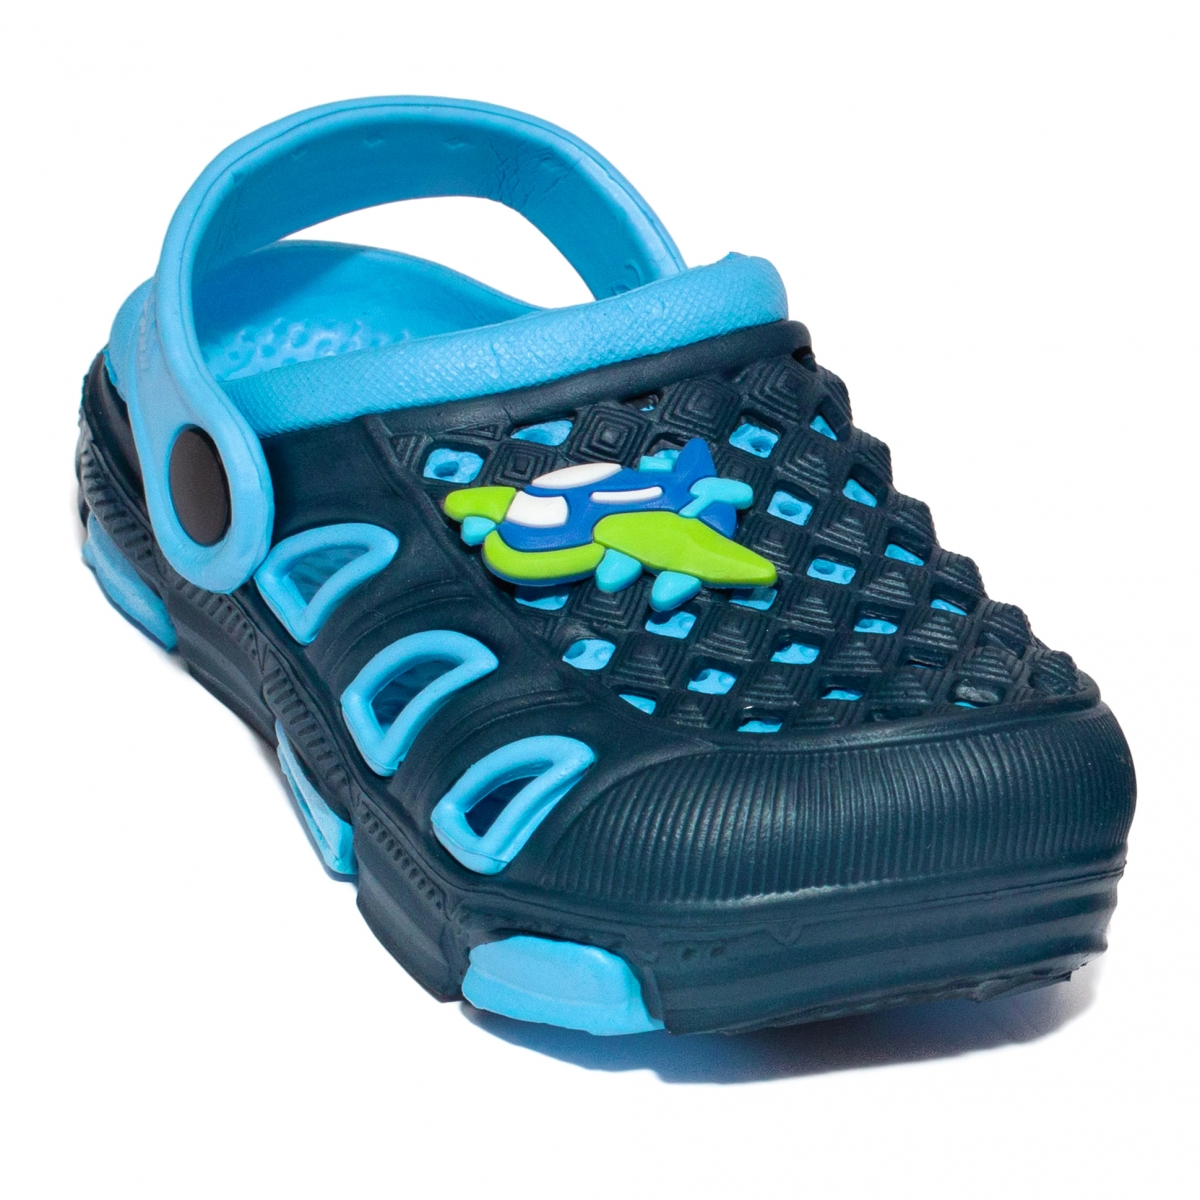 Papuci fete de plaja crocs 5668 mov fuxia 18-35